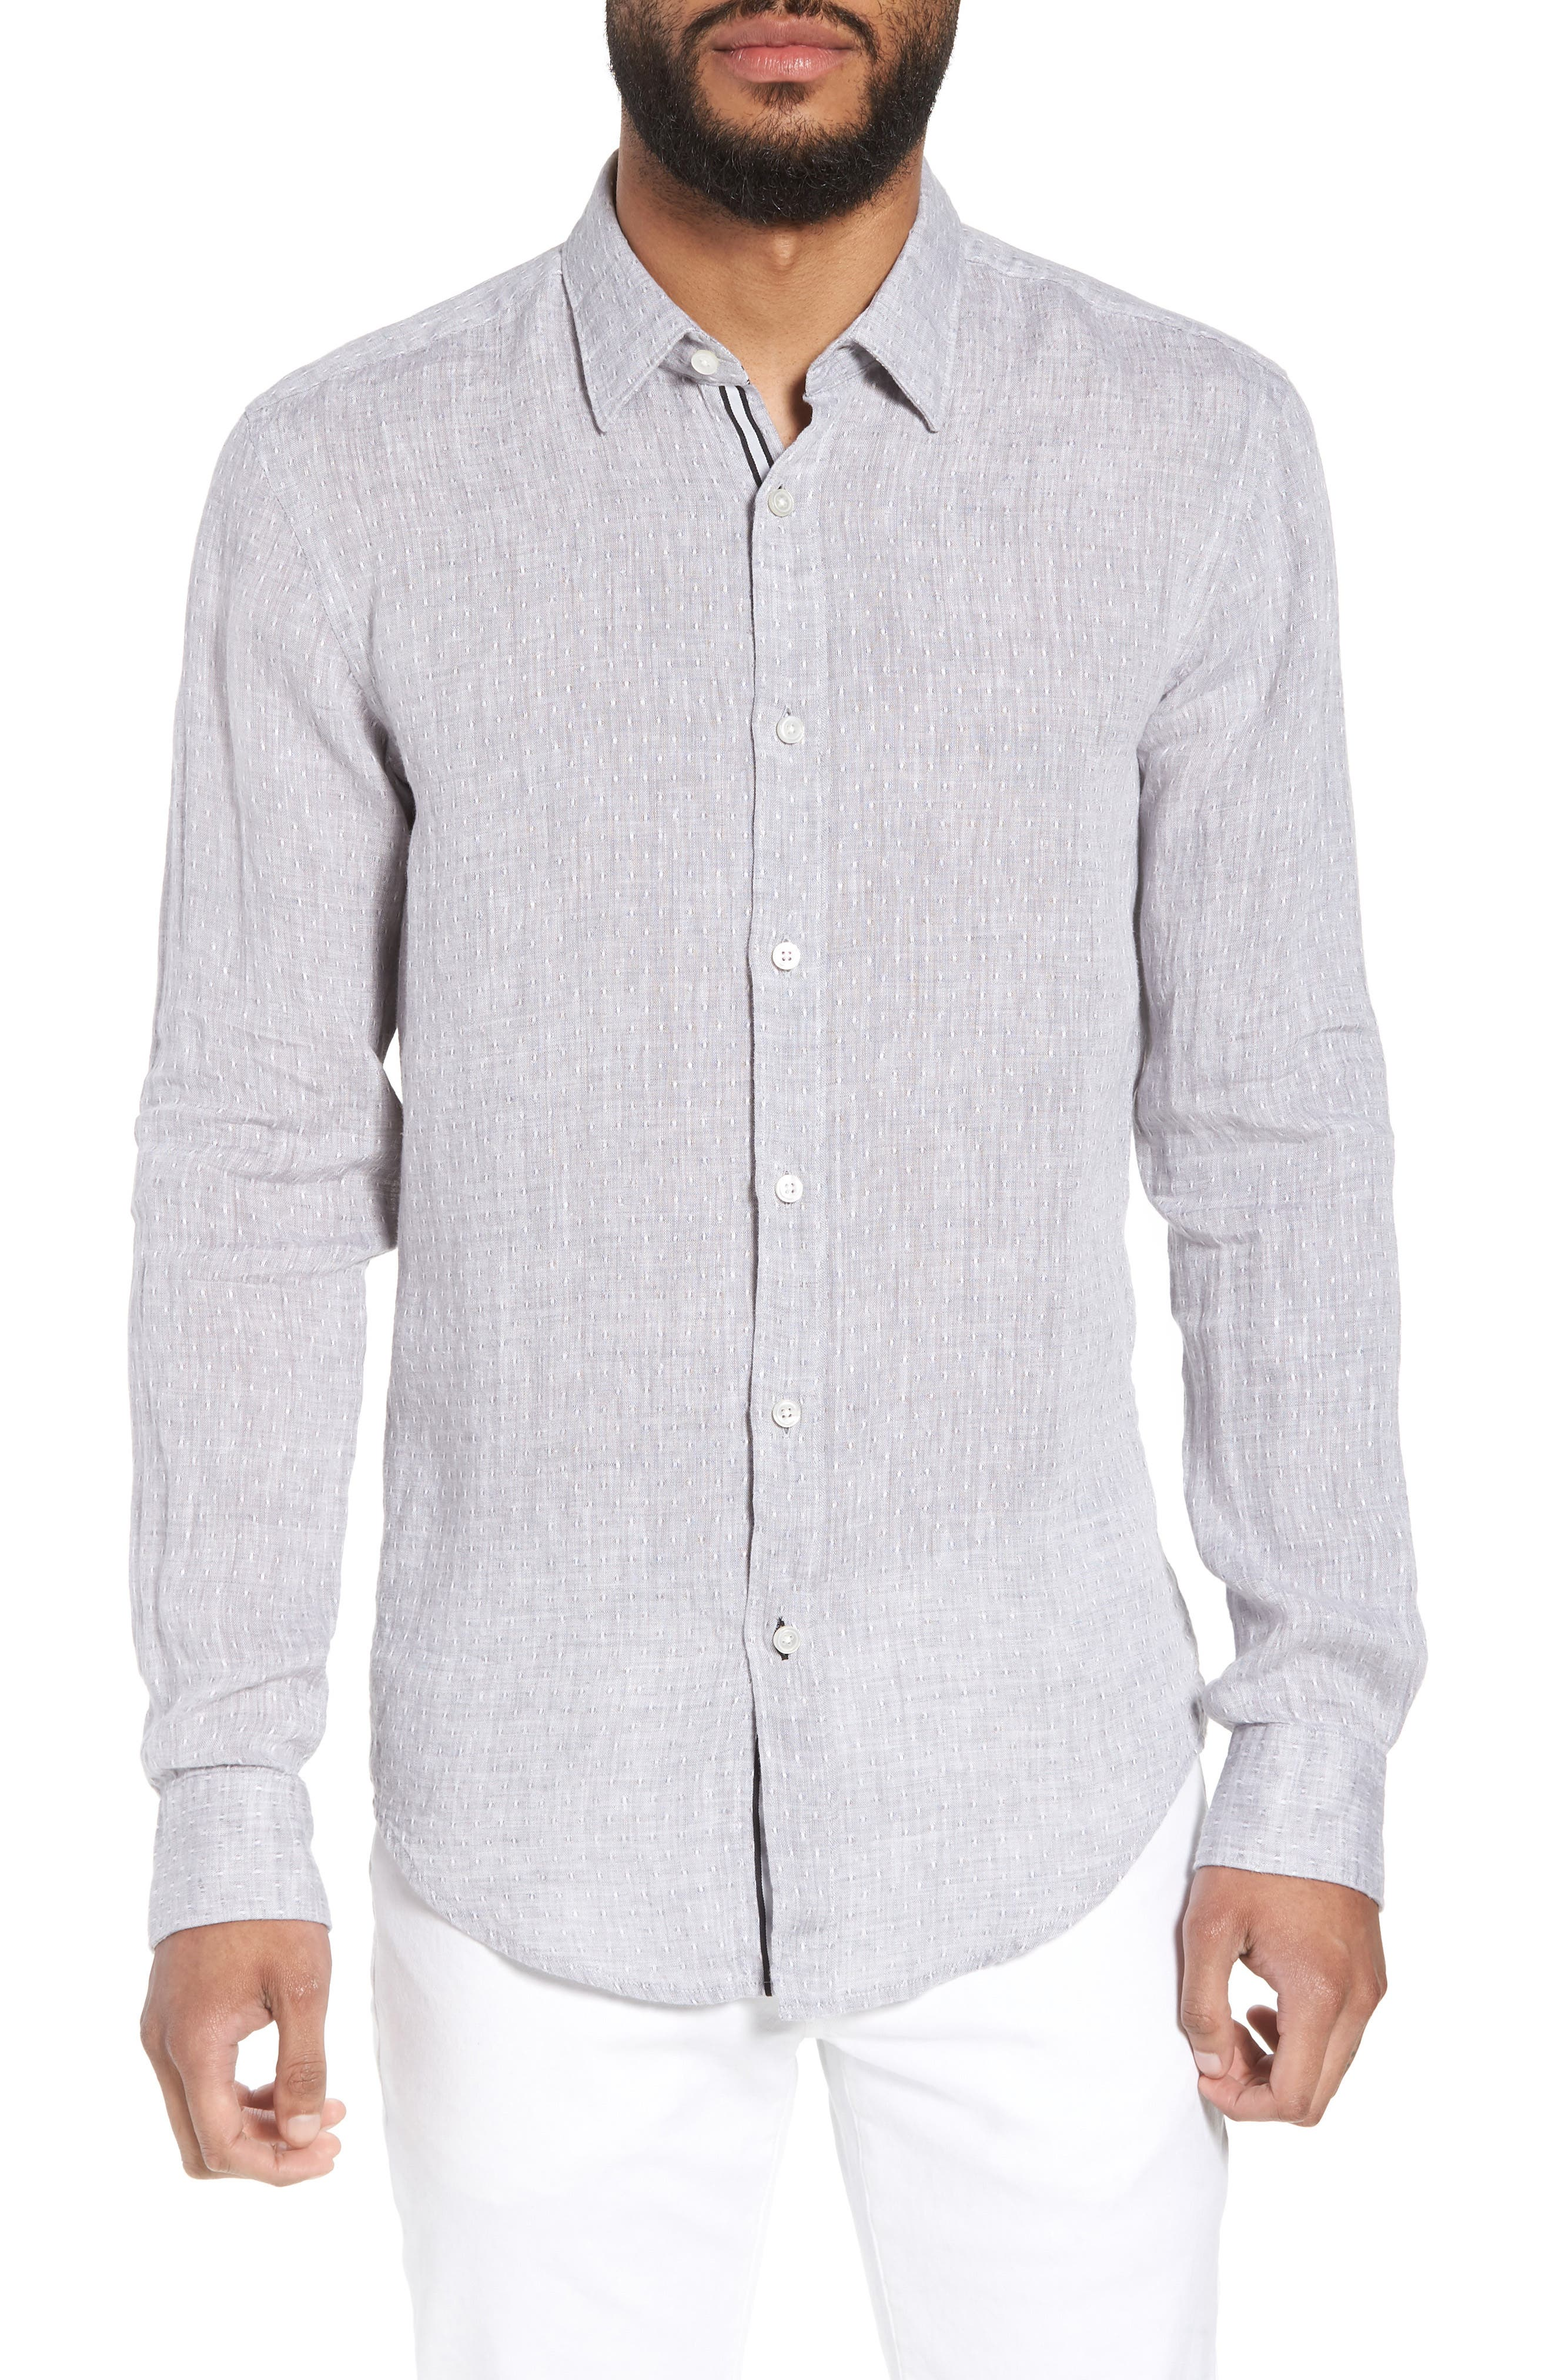 Ronni Slim Fit Dobby Linen Sport Shirt,                             Main thumbnail 1, color,                             071